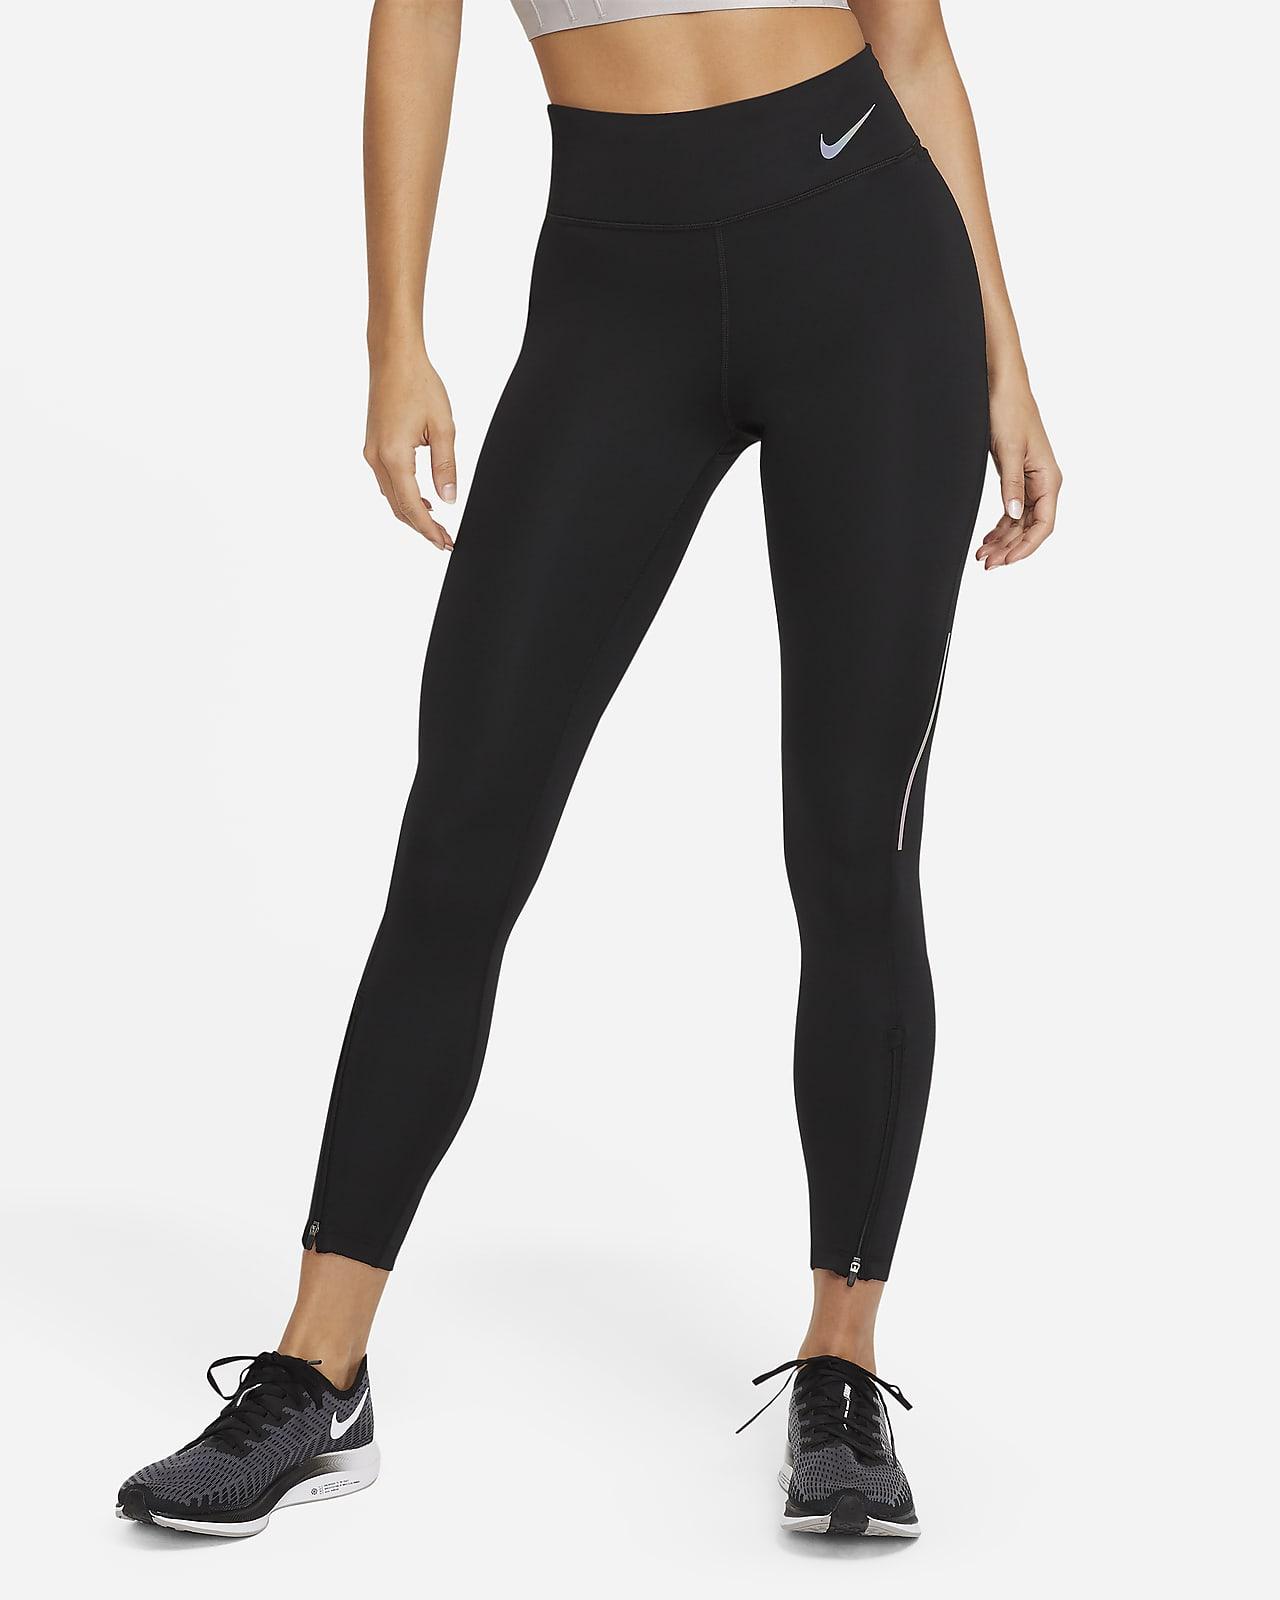 Leggings de running de 7/8 de tiro medio para mujer Nike Epic Faster